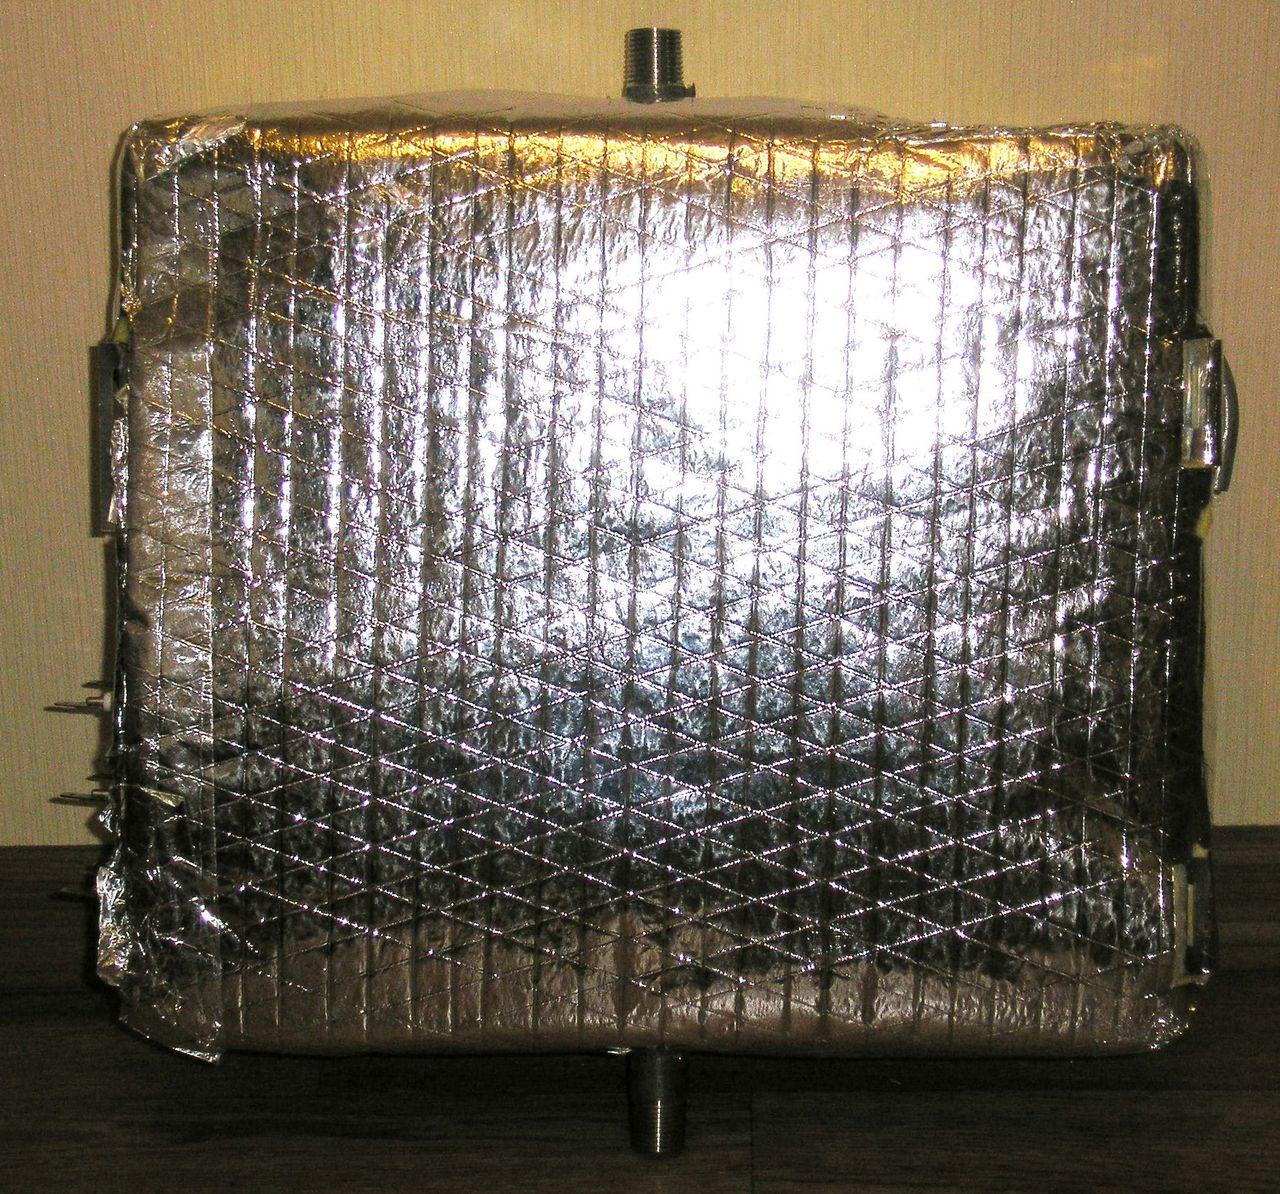 HARVIA Бак для воды для парогенератора HGS, артикул ZG-110